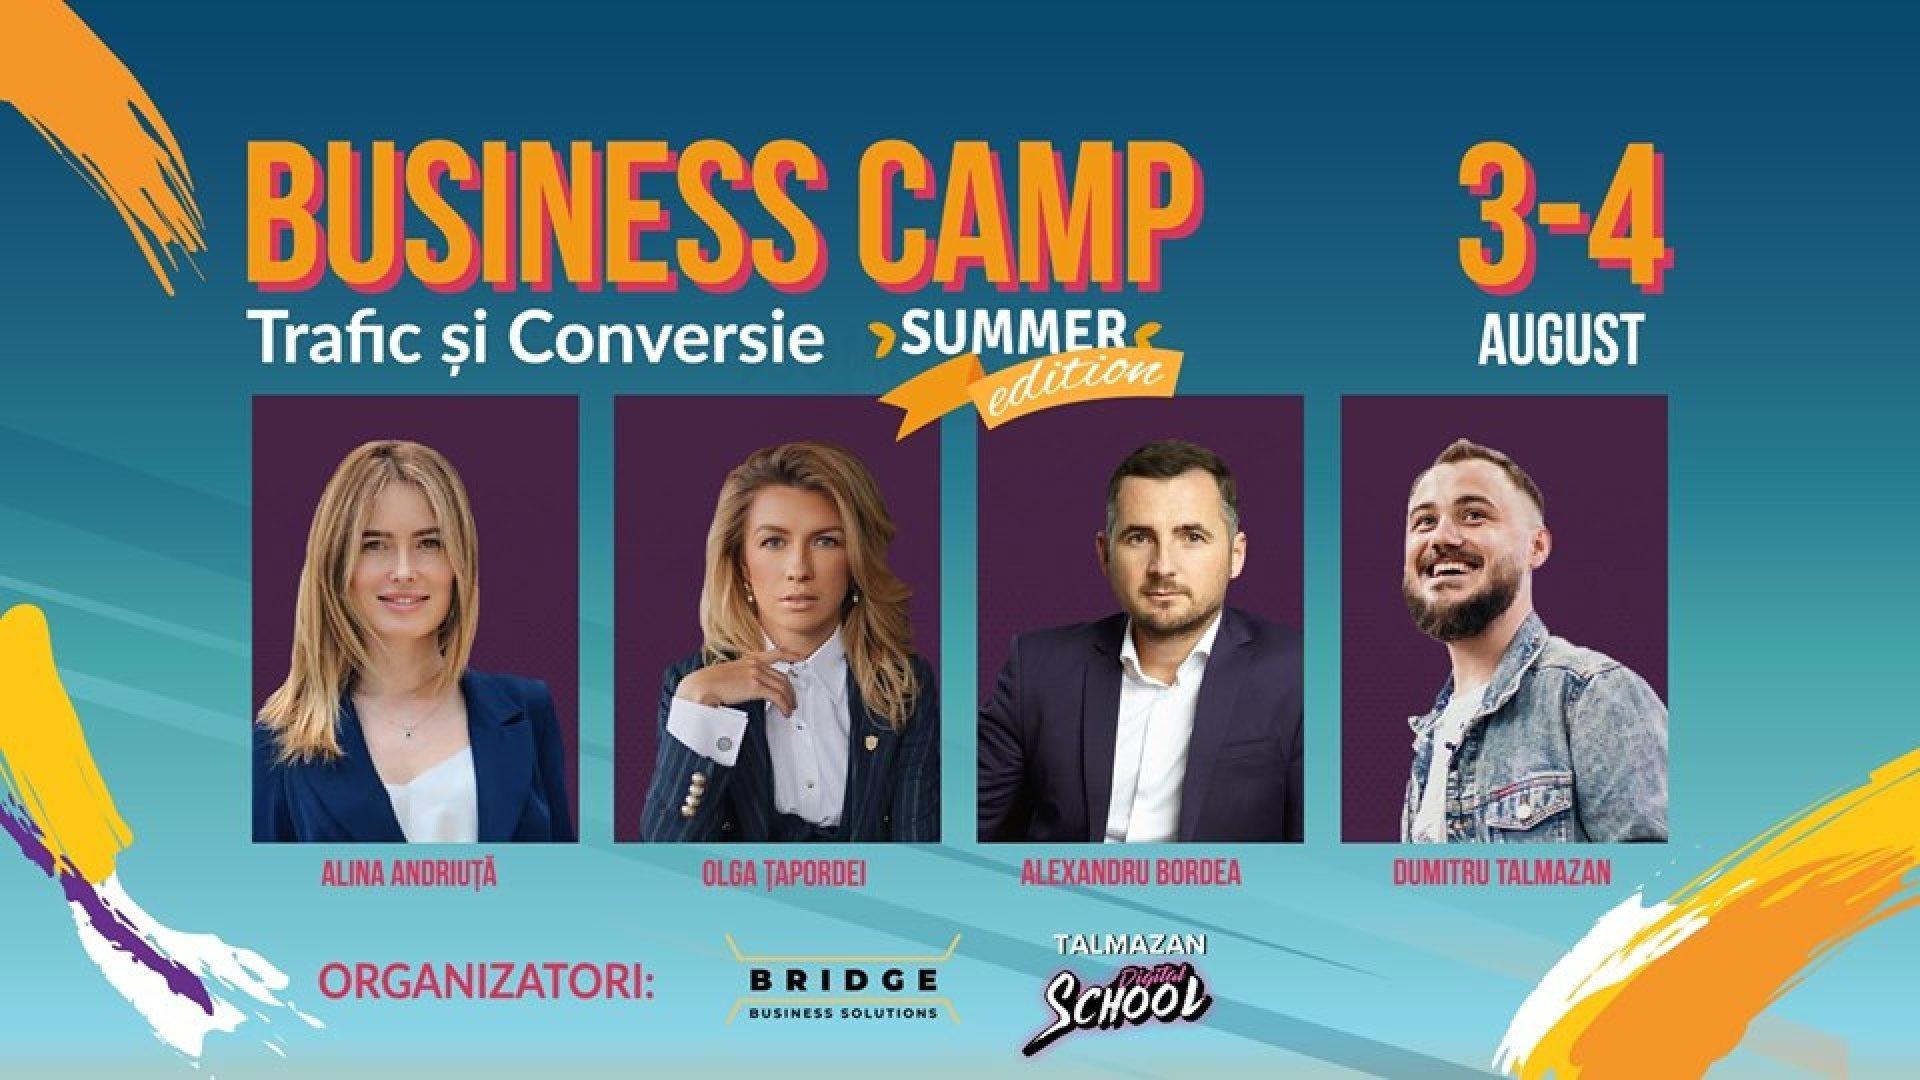 Business Camp - Trafic si Conversie |Summer edition